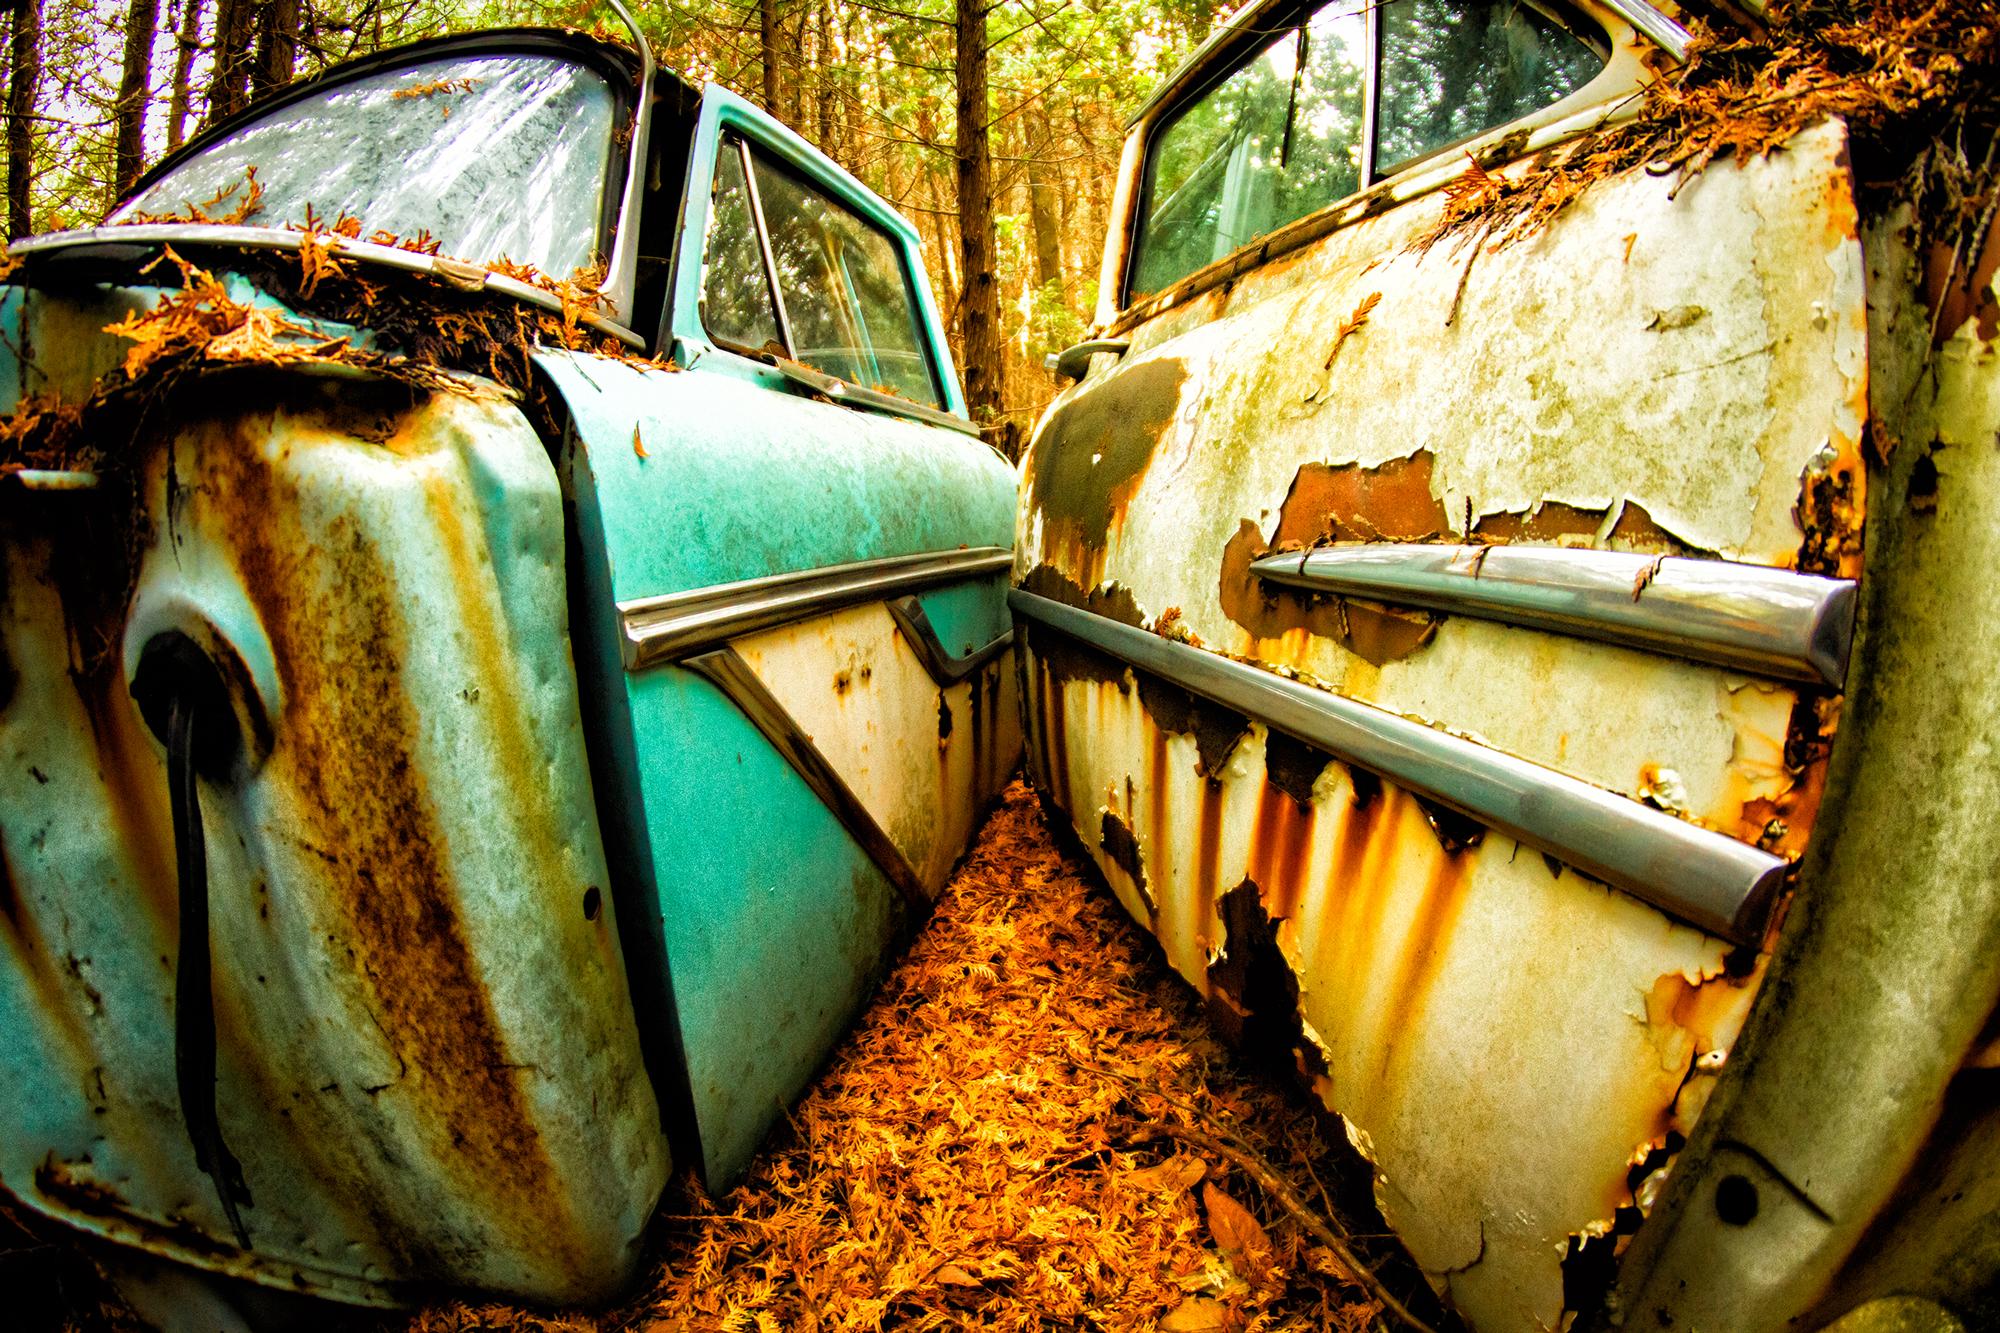 Rusted doors in a junkyard make auto eROTica art